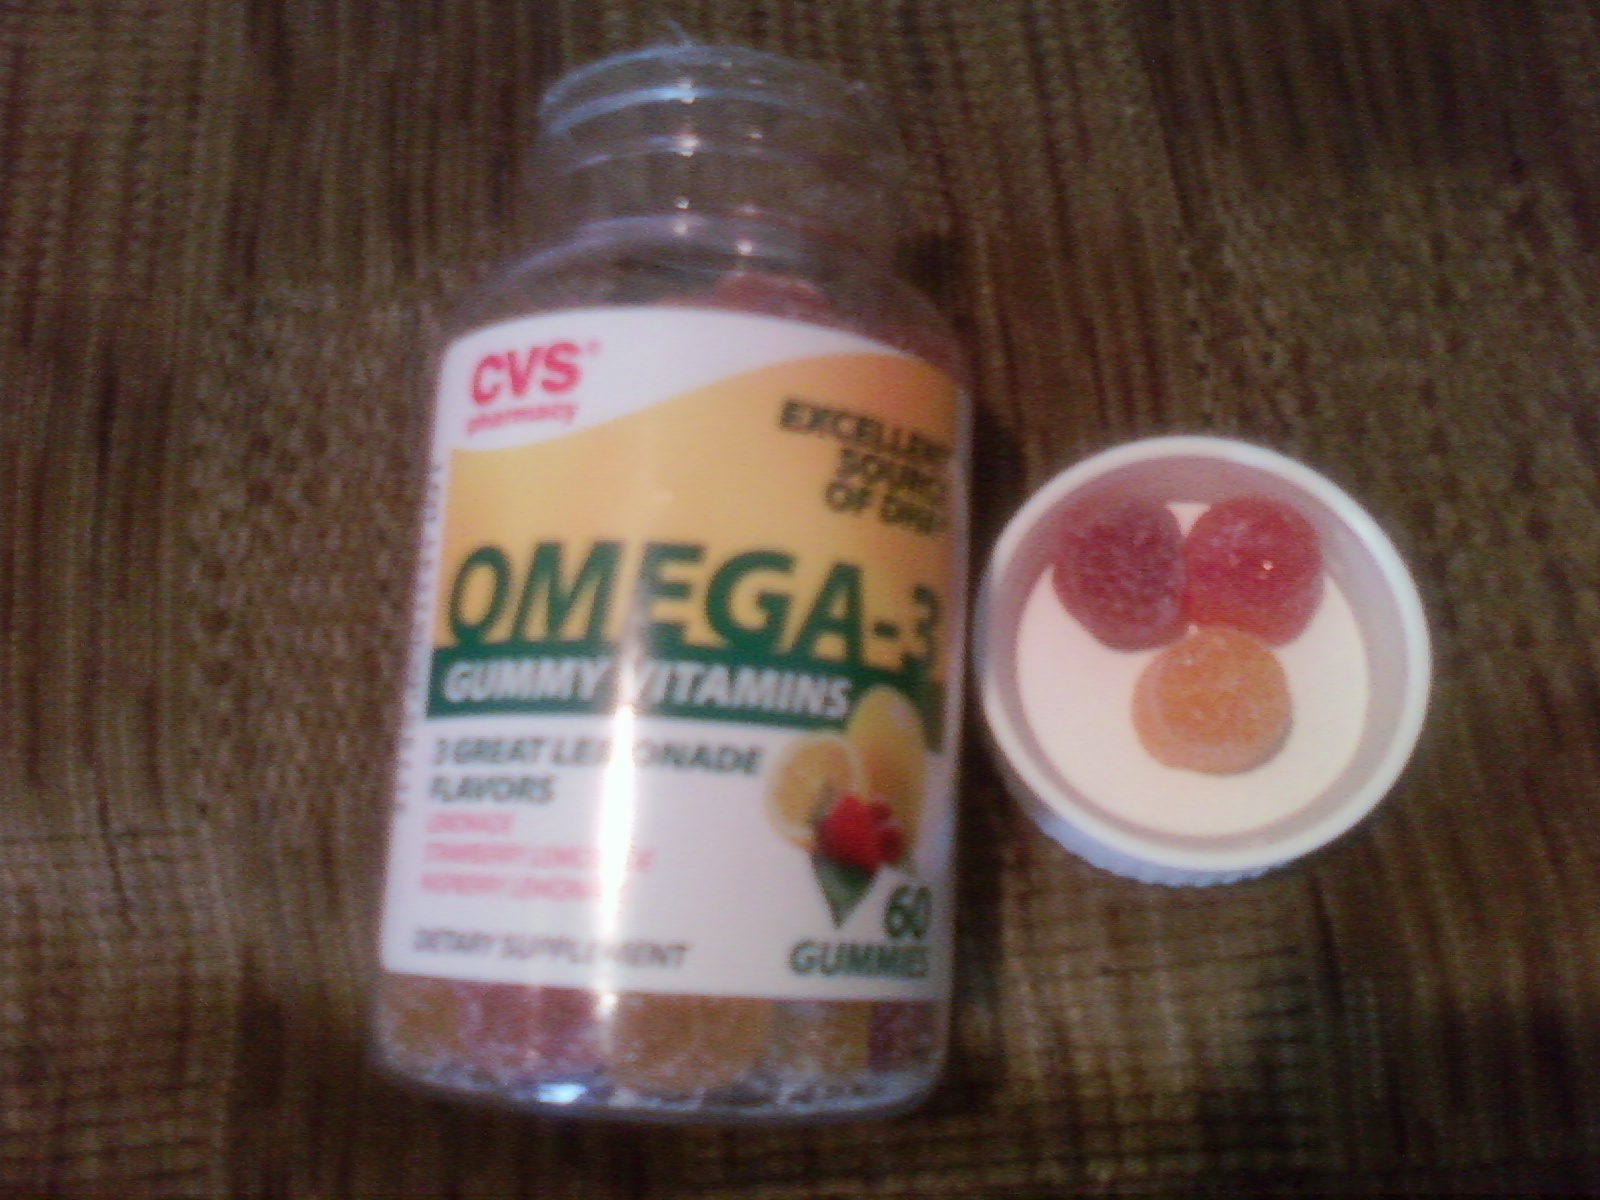 Princess beauty lounge cvs haul gummy omega 3 fish oil for Cvs fish oil